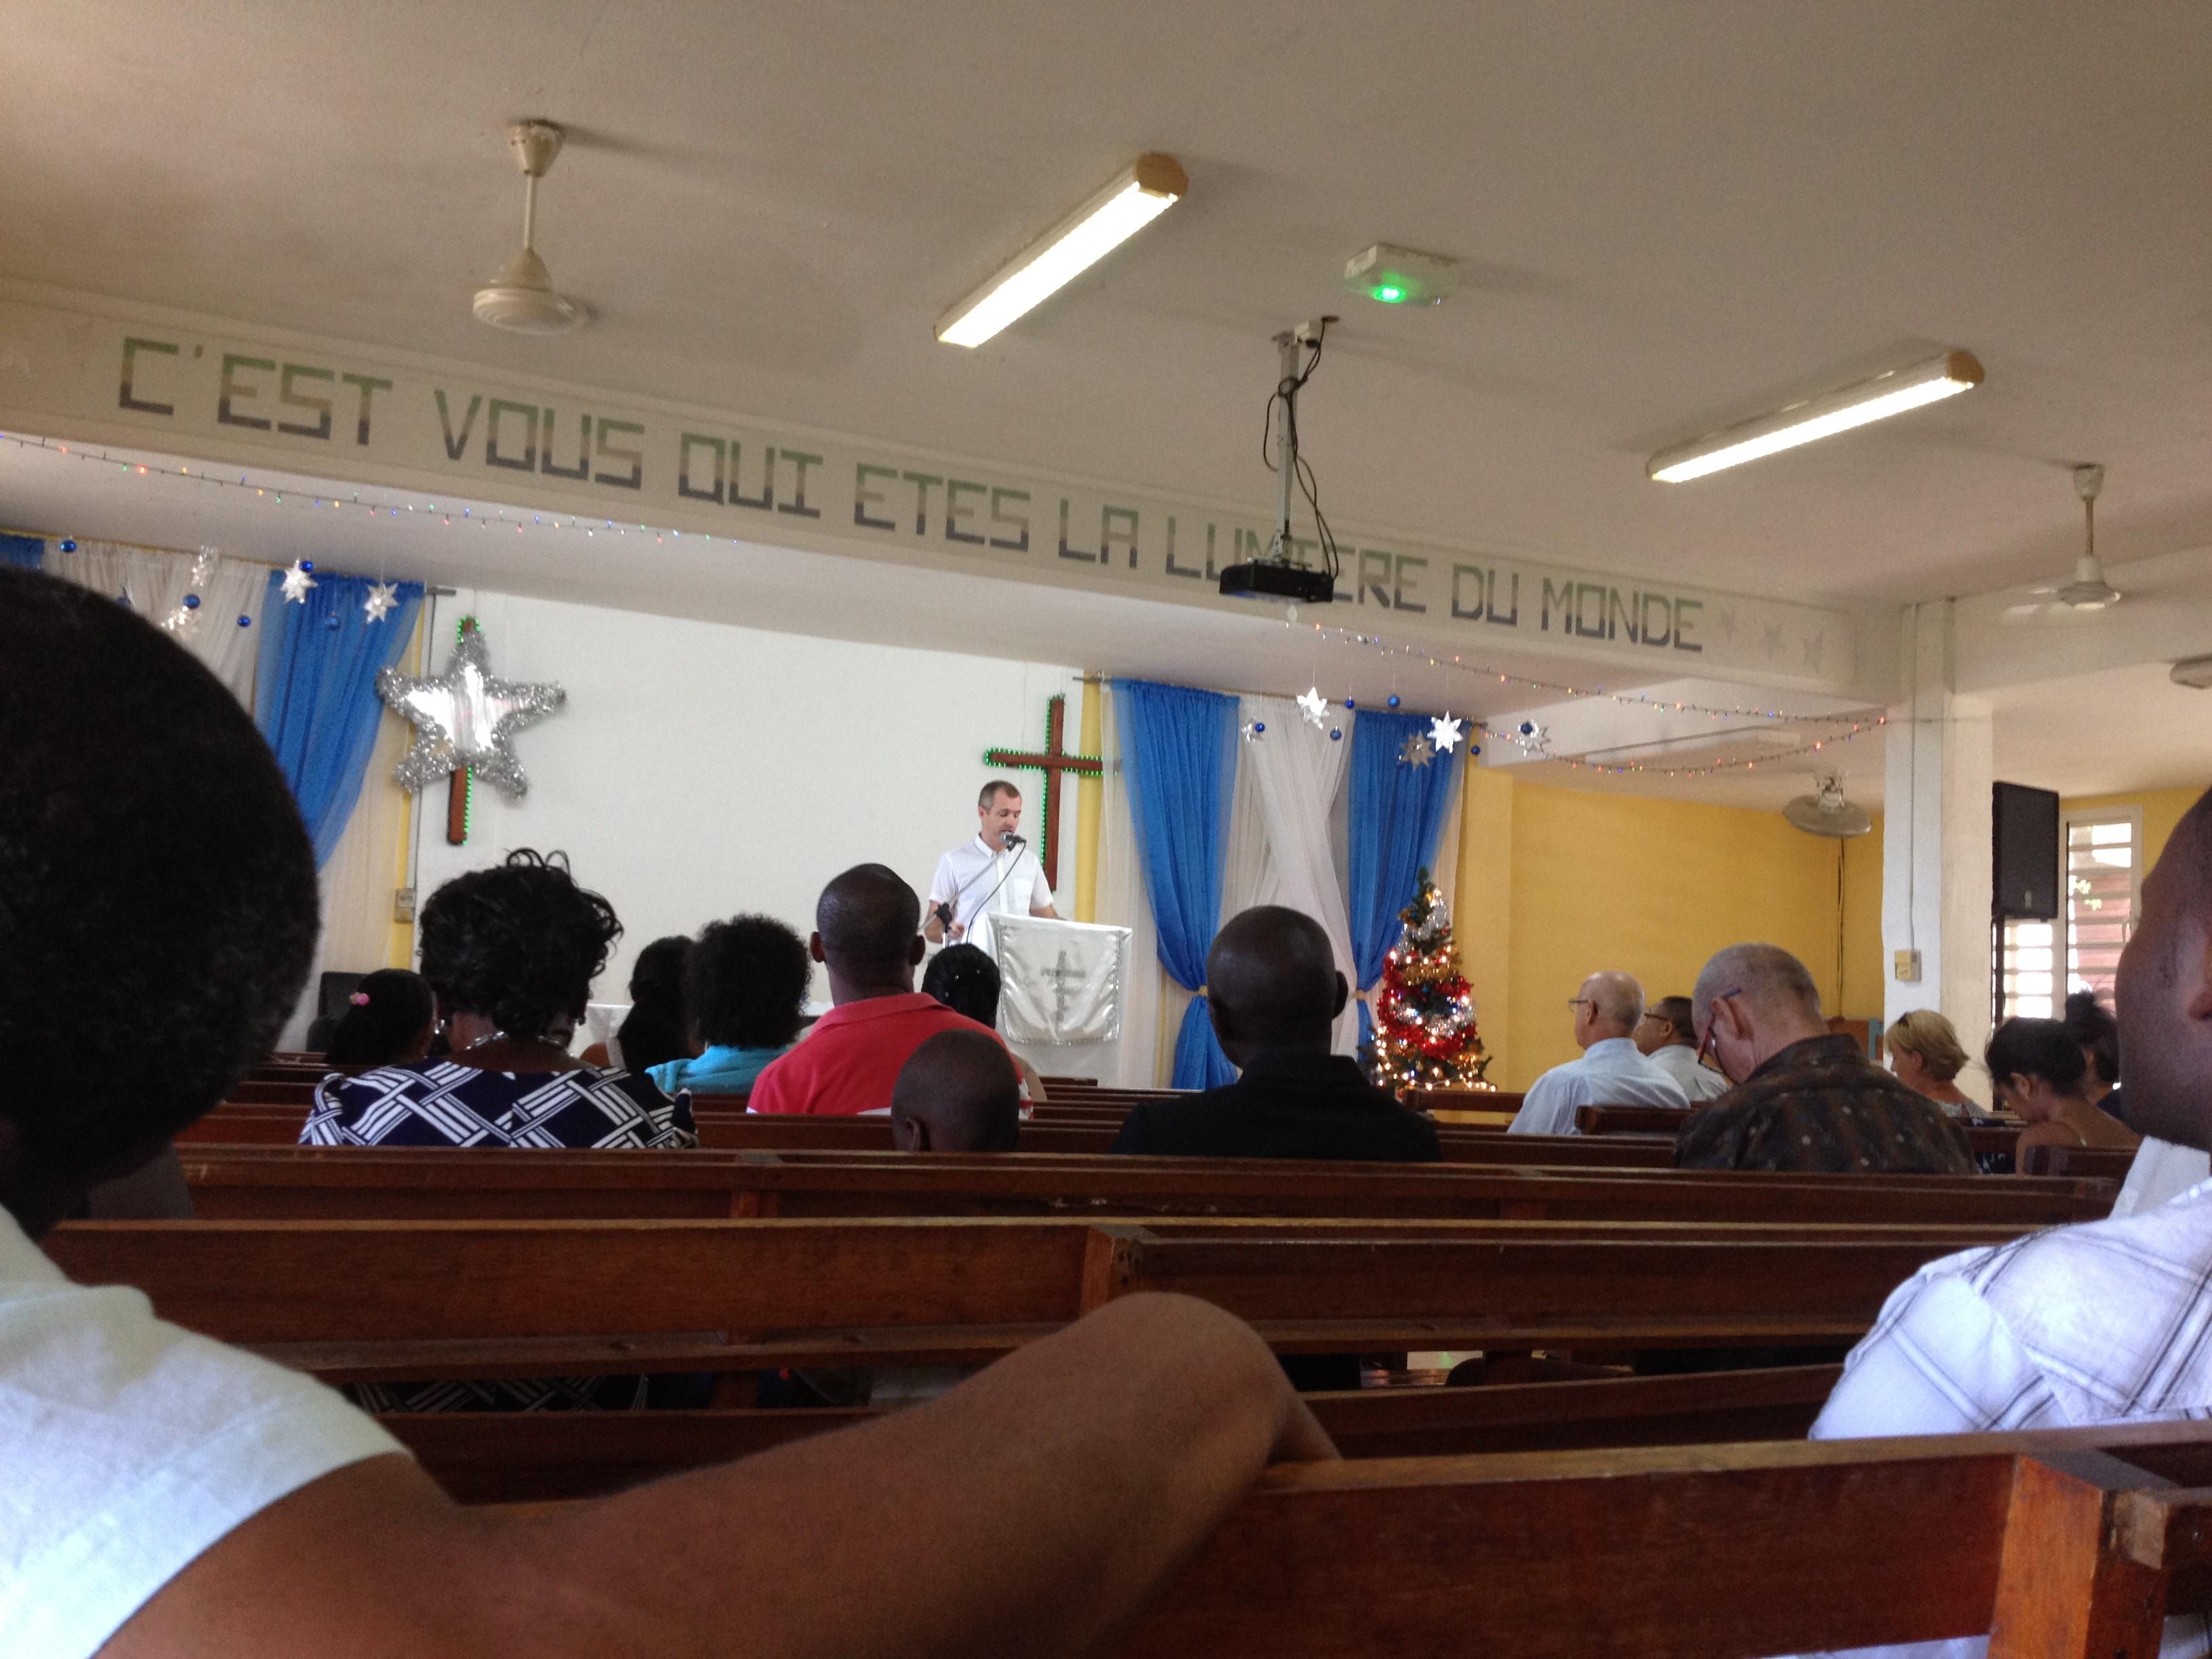 Donegal Town Presbyterian Church Mission Bulletin